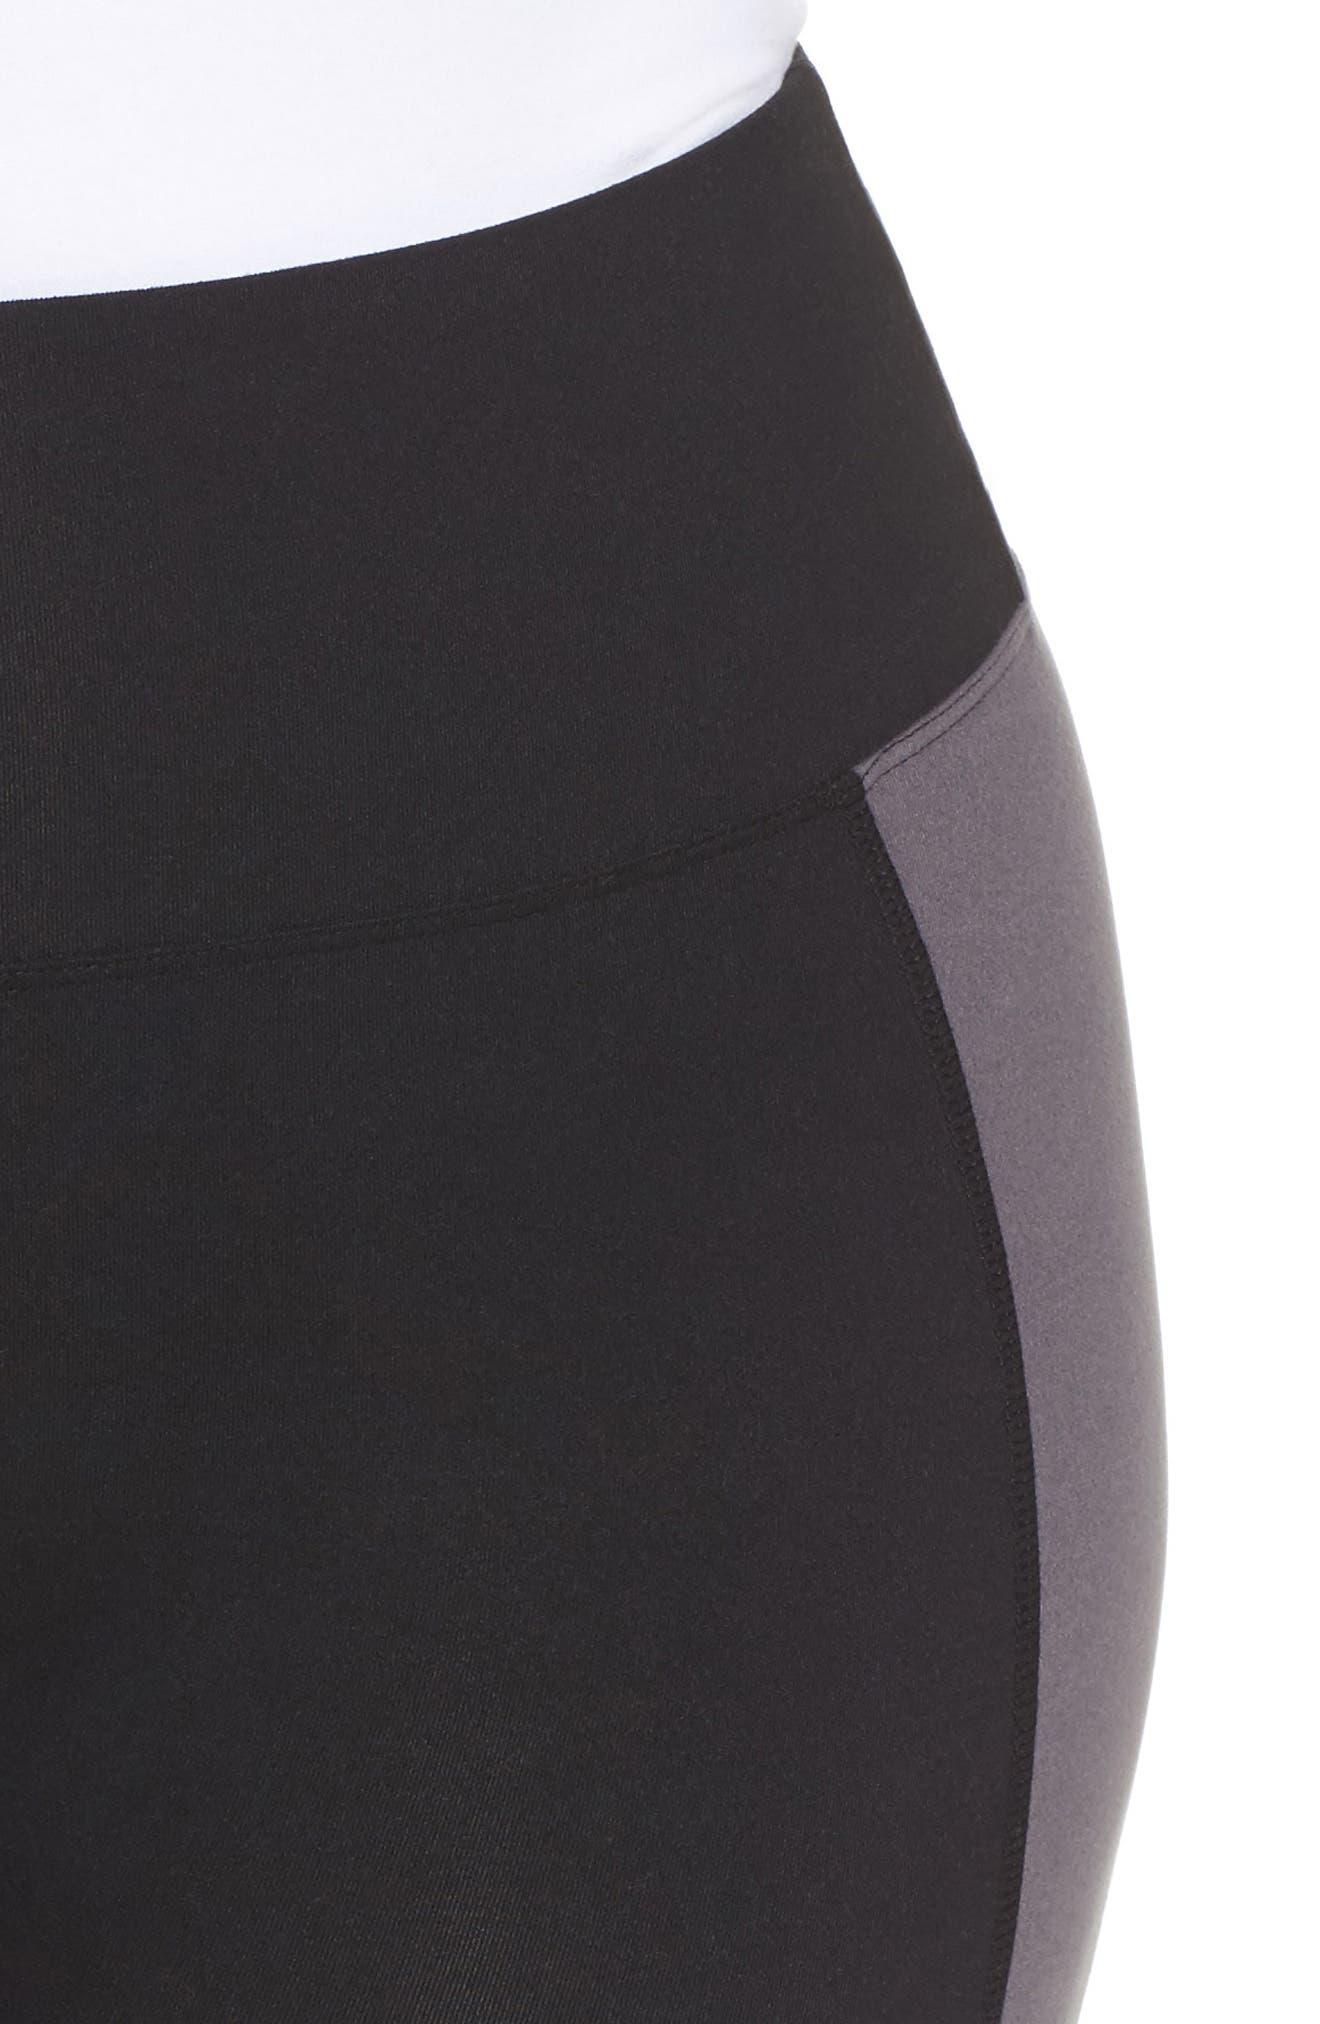 Colorblock Leggings,                             Alternate thumbnail 6, color,                             Black/ Push-Up Pink